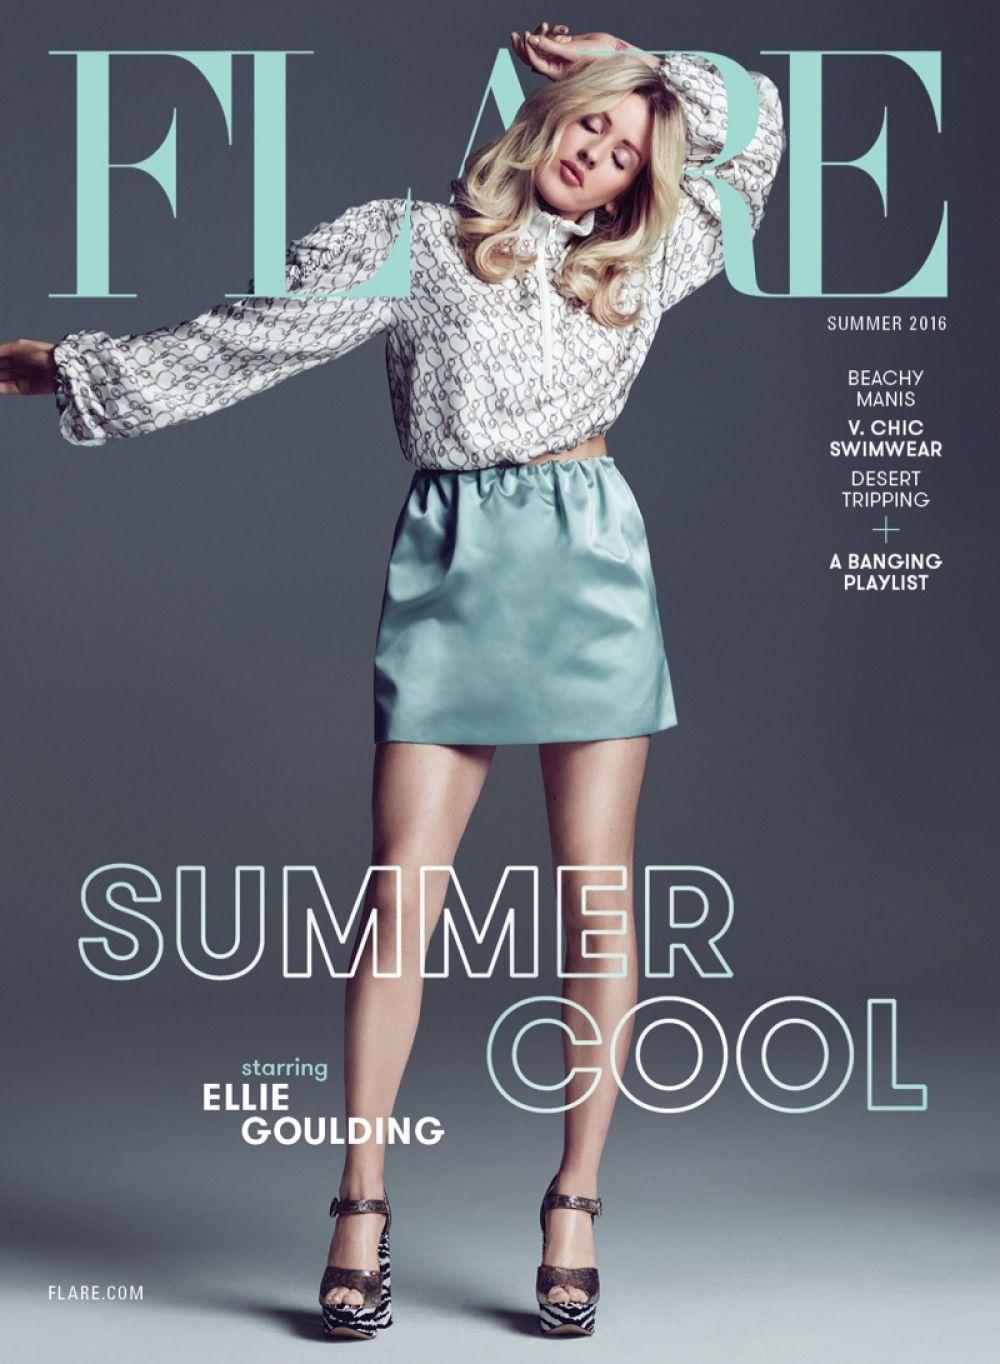 ELLIE GOULDING in Flare Magazine, Summer 2016 Issue